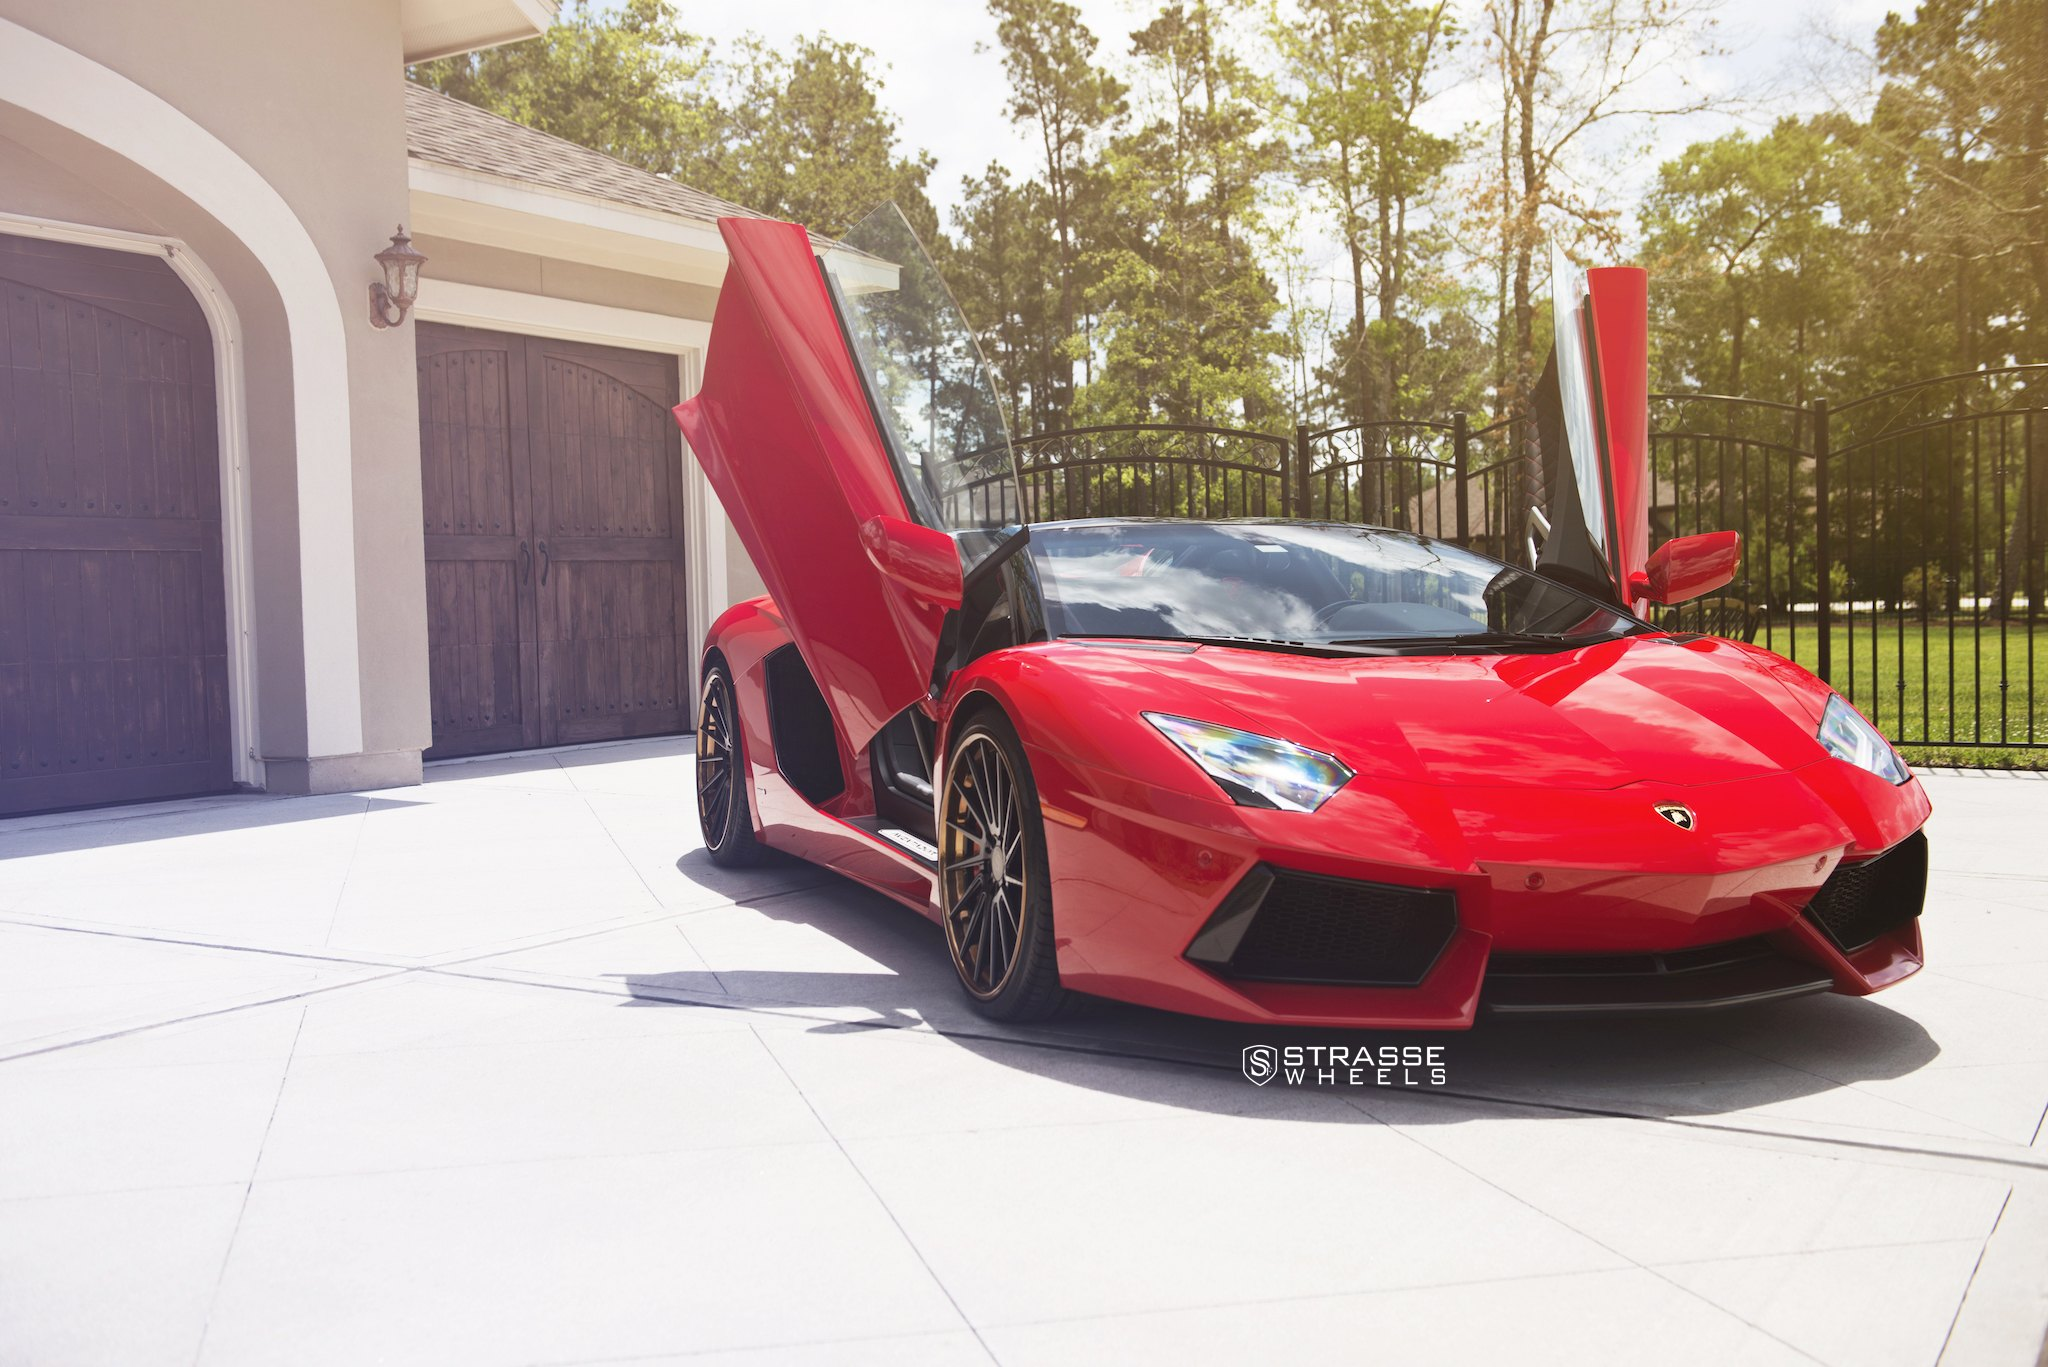 Epic Red Lamborghini Aventador Boasting Vertical Doors Carid Com